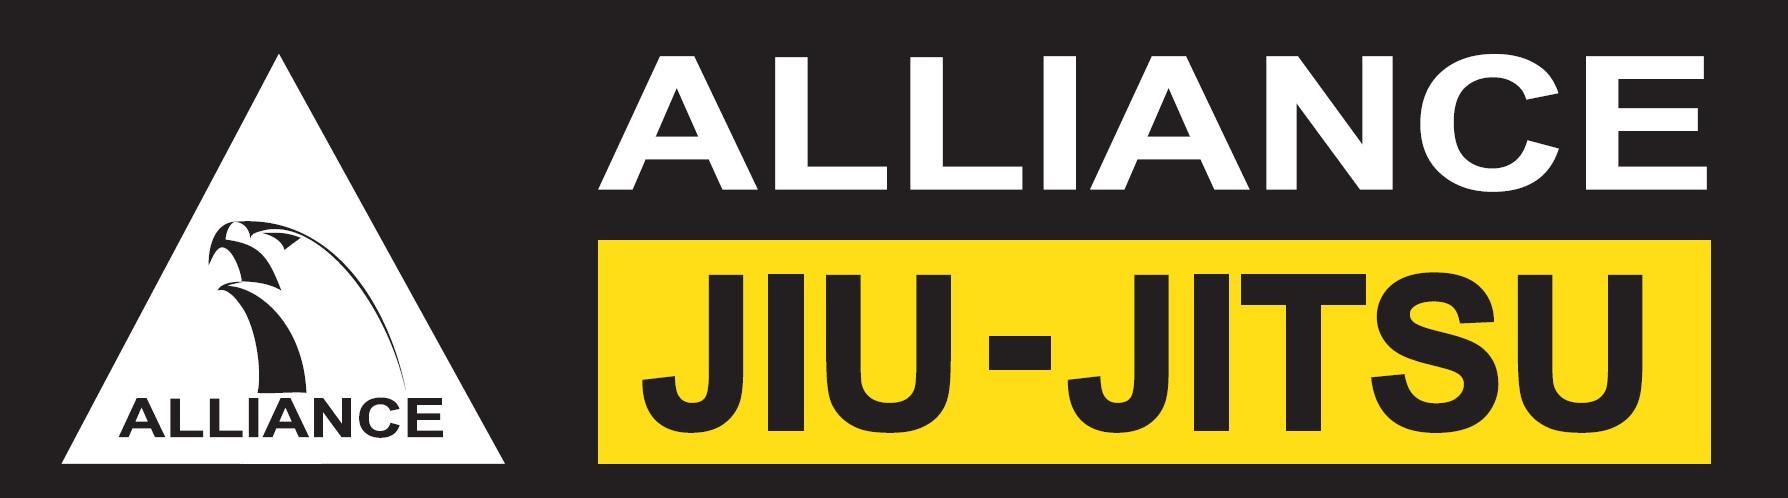 Alliance Jiu-Jitsu and Kickboxing Kelowna